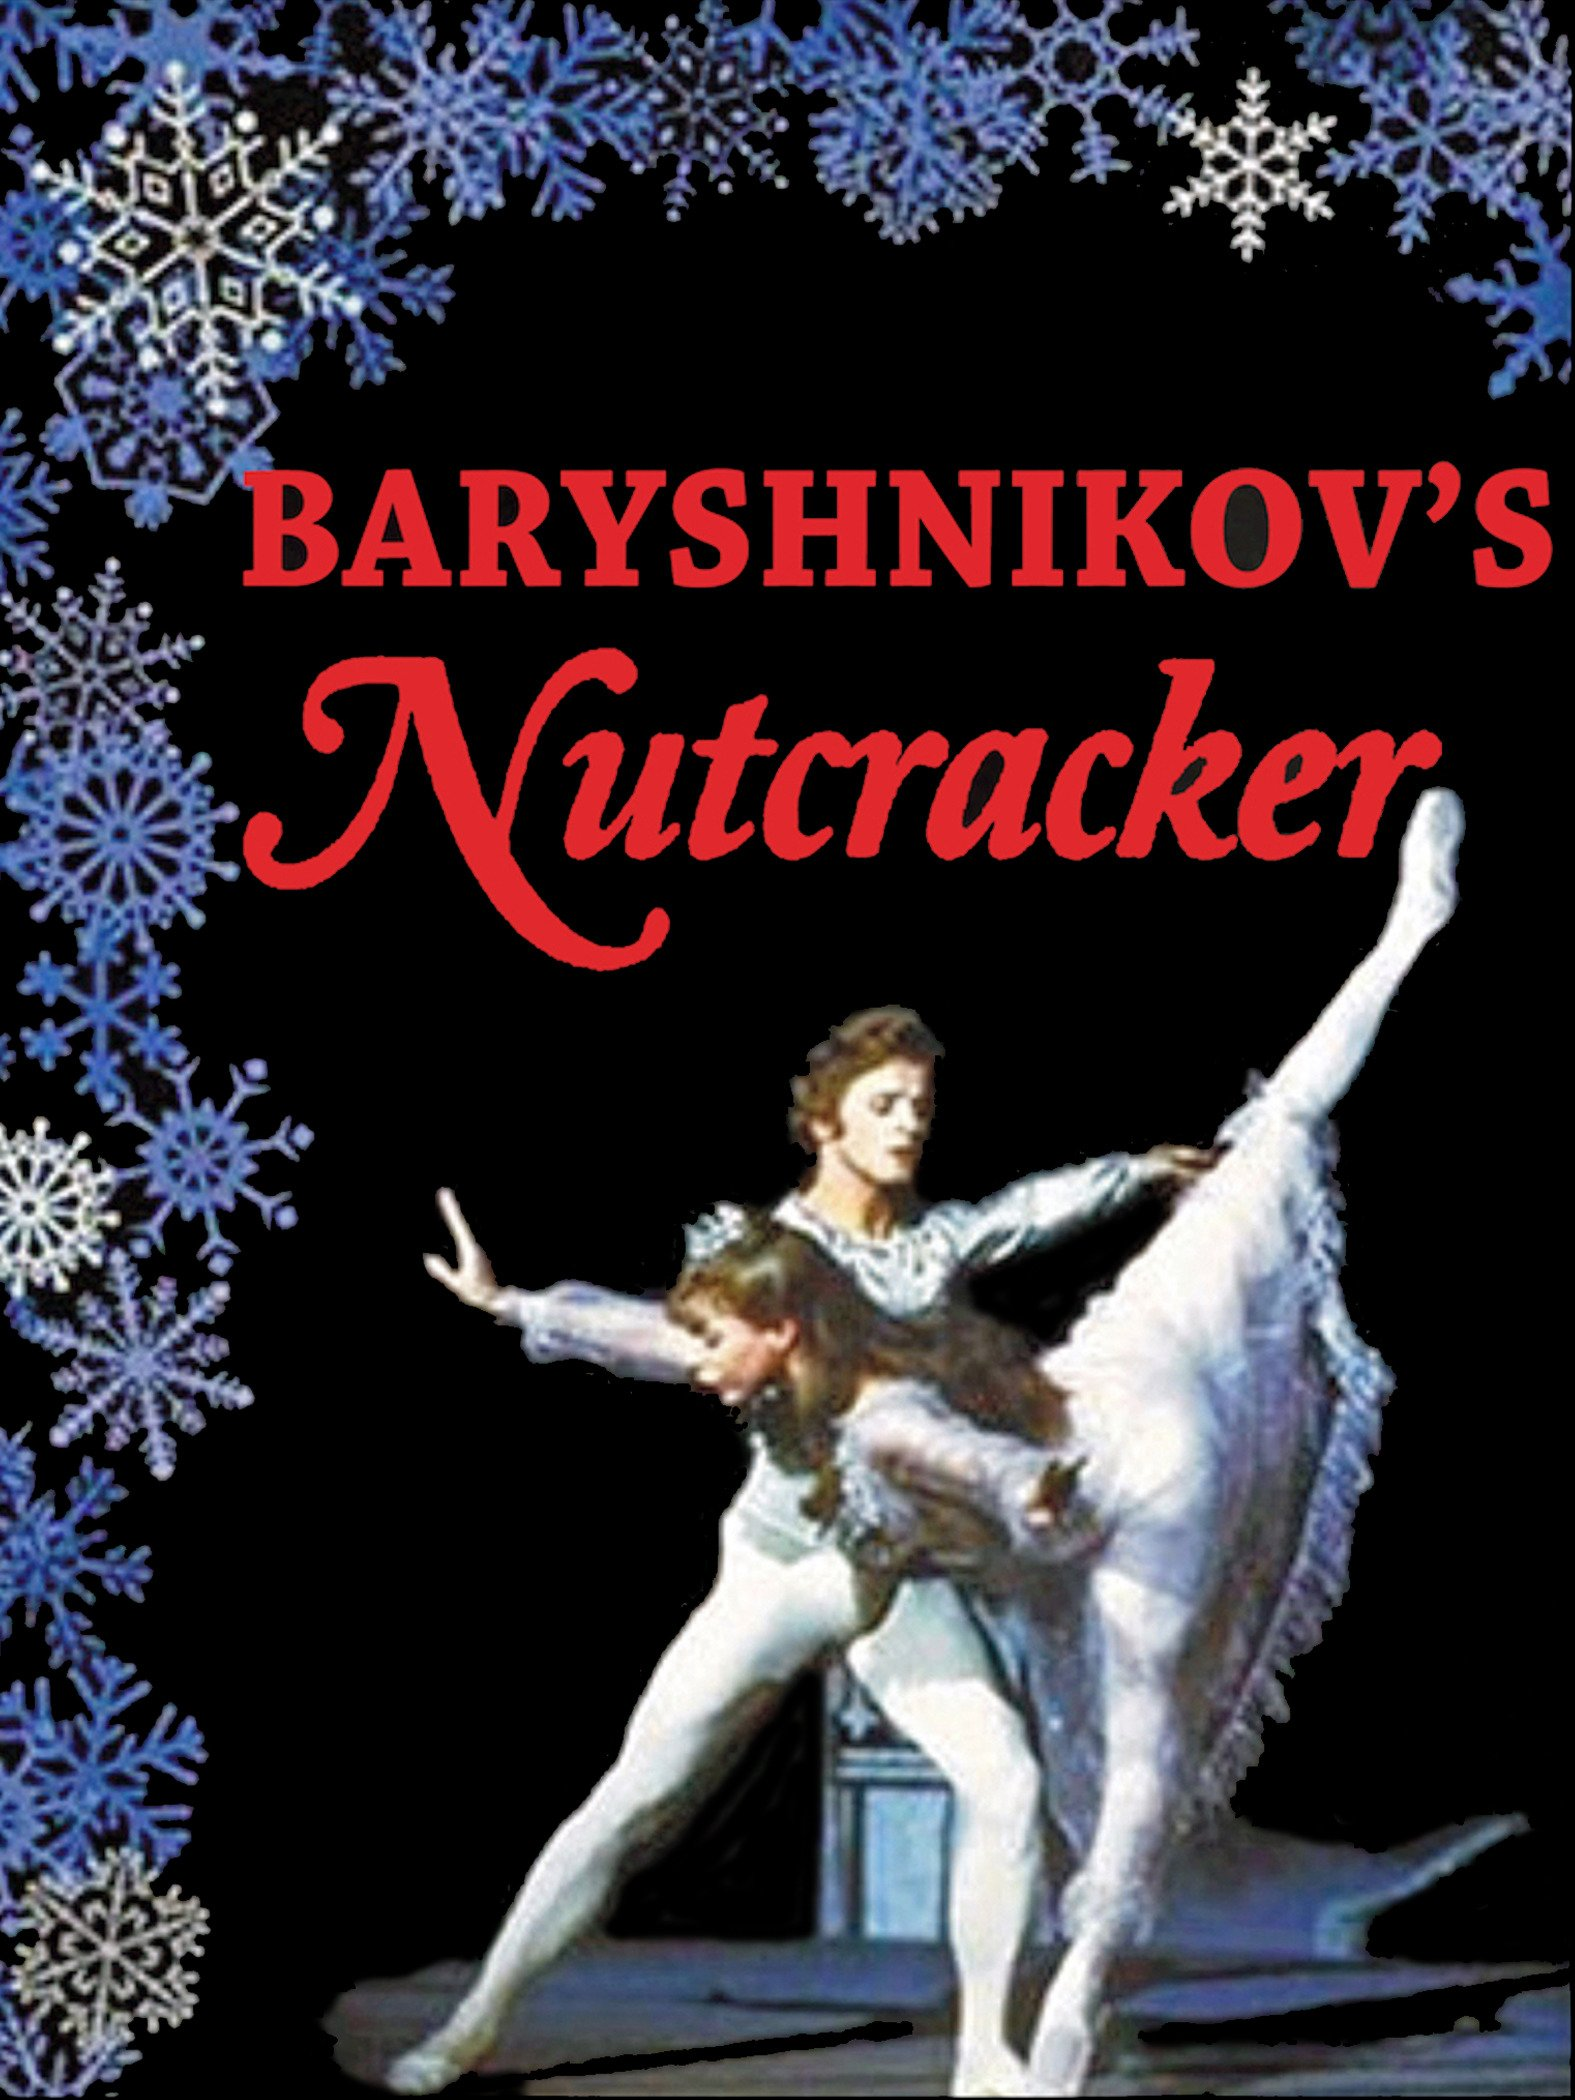 Baryshnikov's Nutcracker